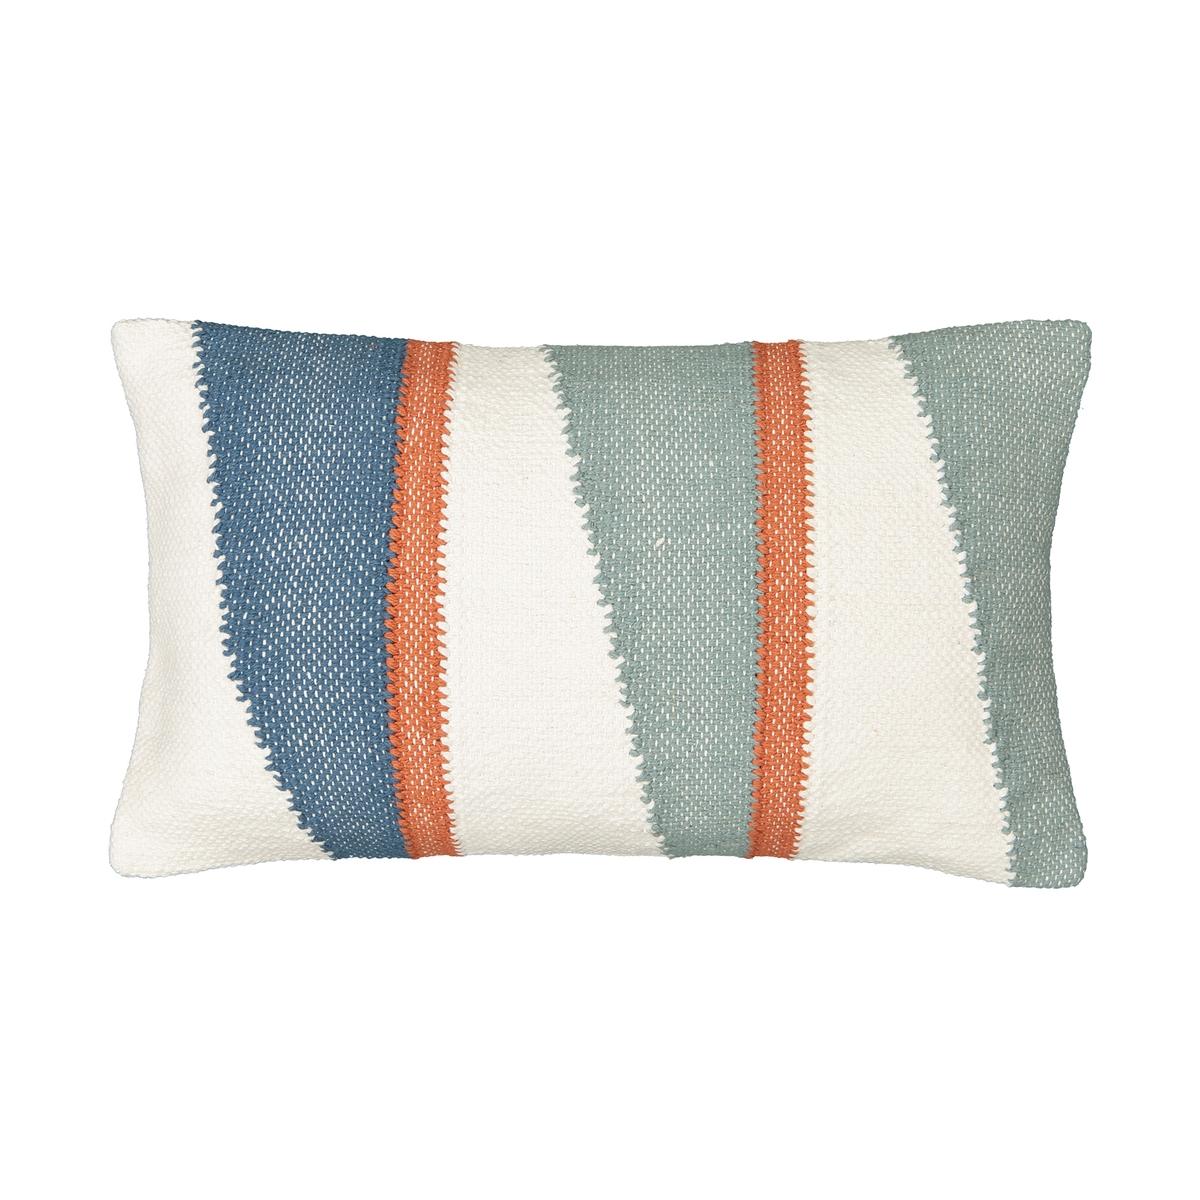 Чехол La Redoute На подушку Chillan 50 x 30 см разноцветный наволочка la redoute flooch 50 x 30 см бежевый